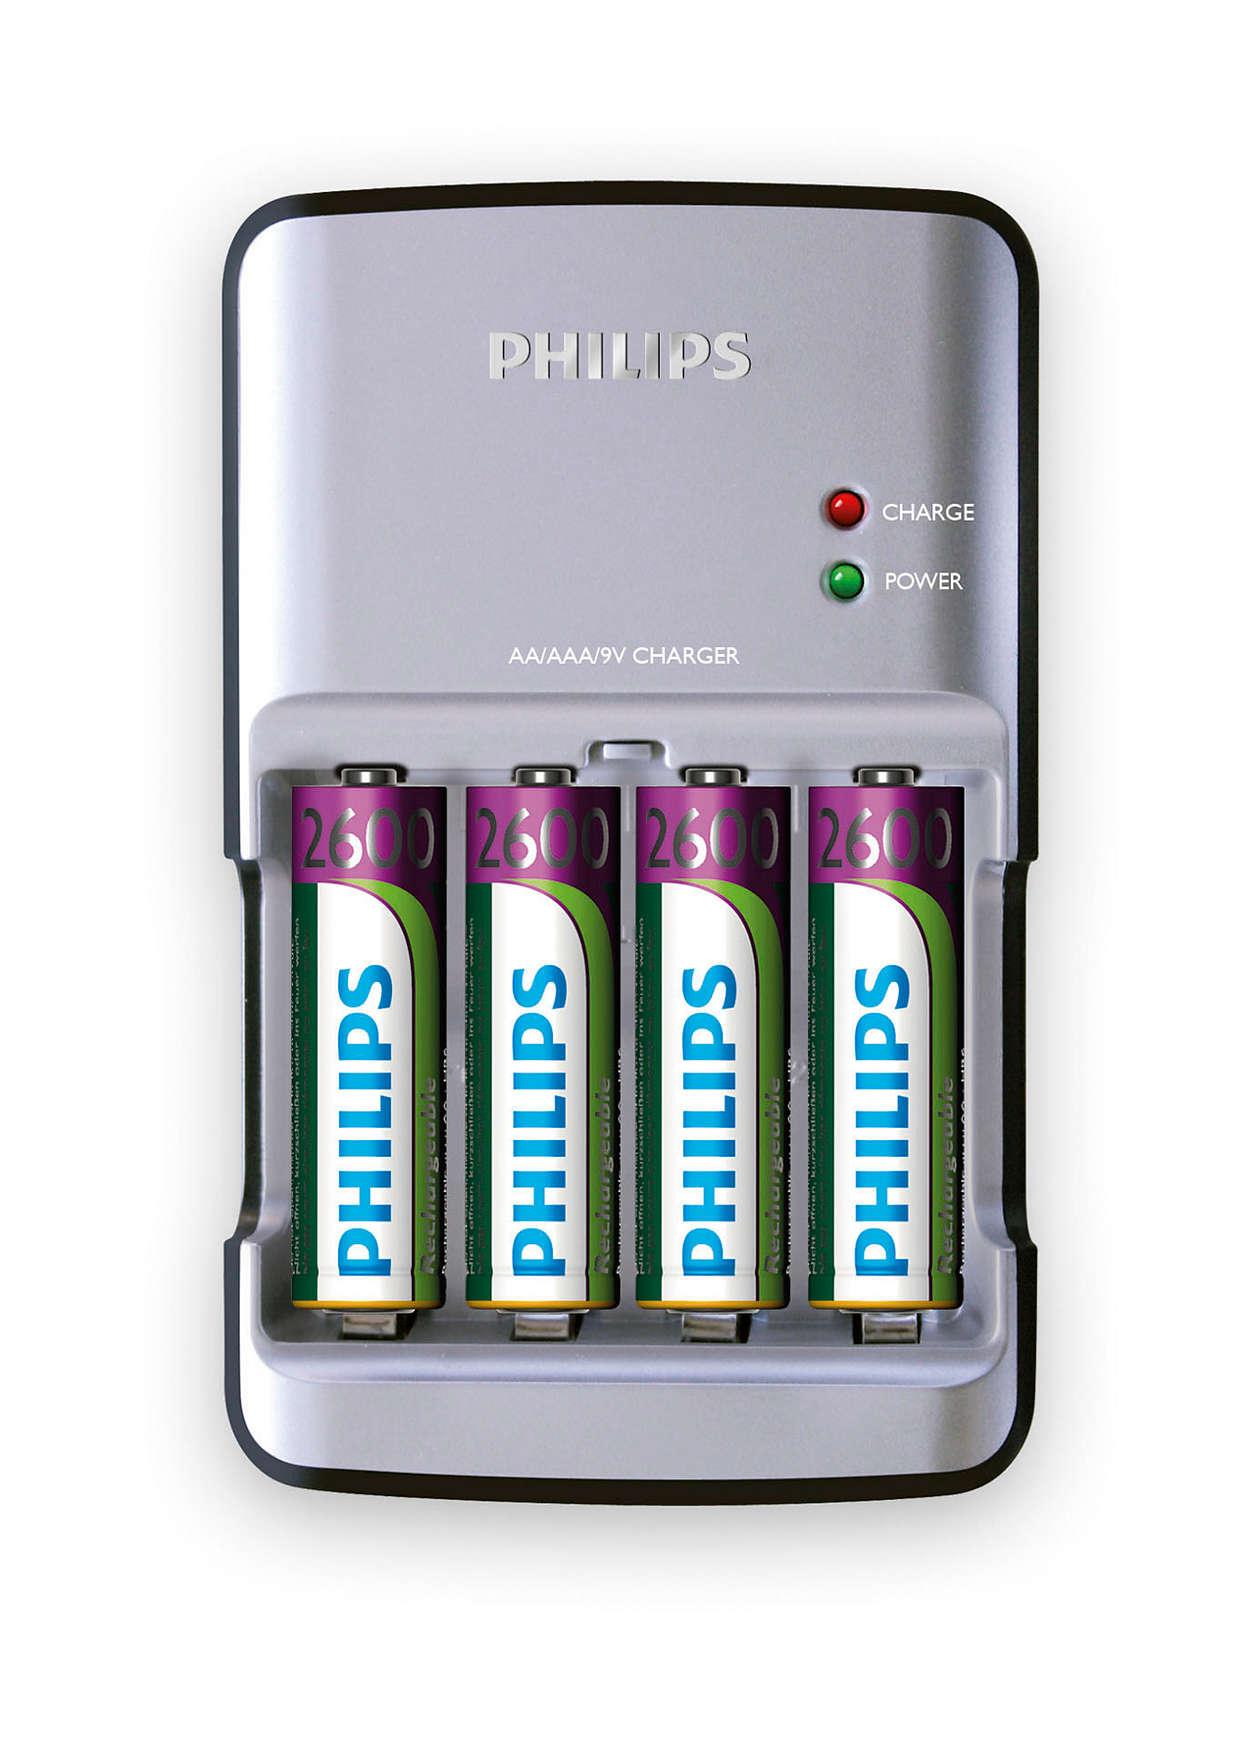 Brzo puni AA, AAA i baterije od 9 V